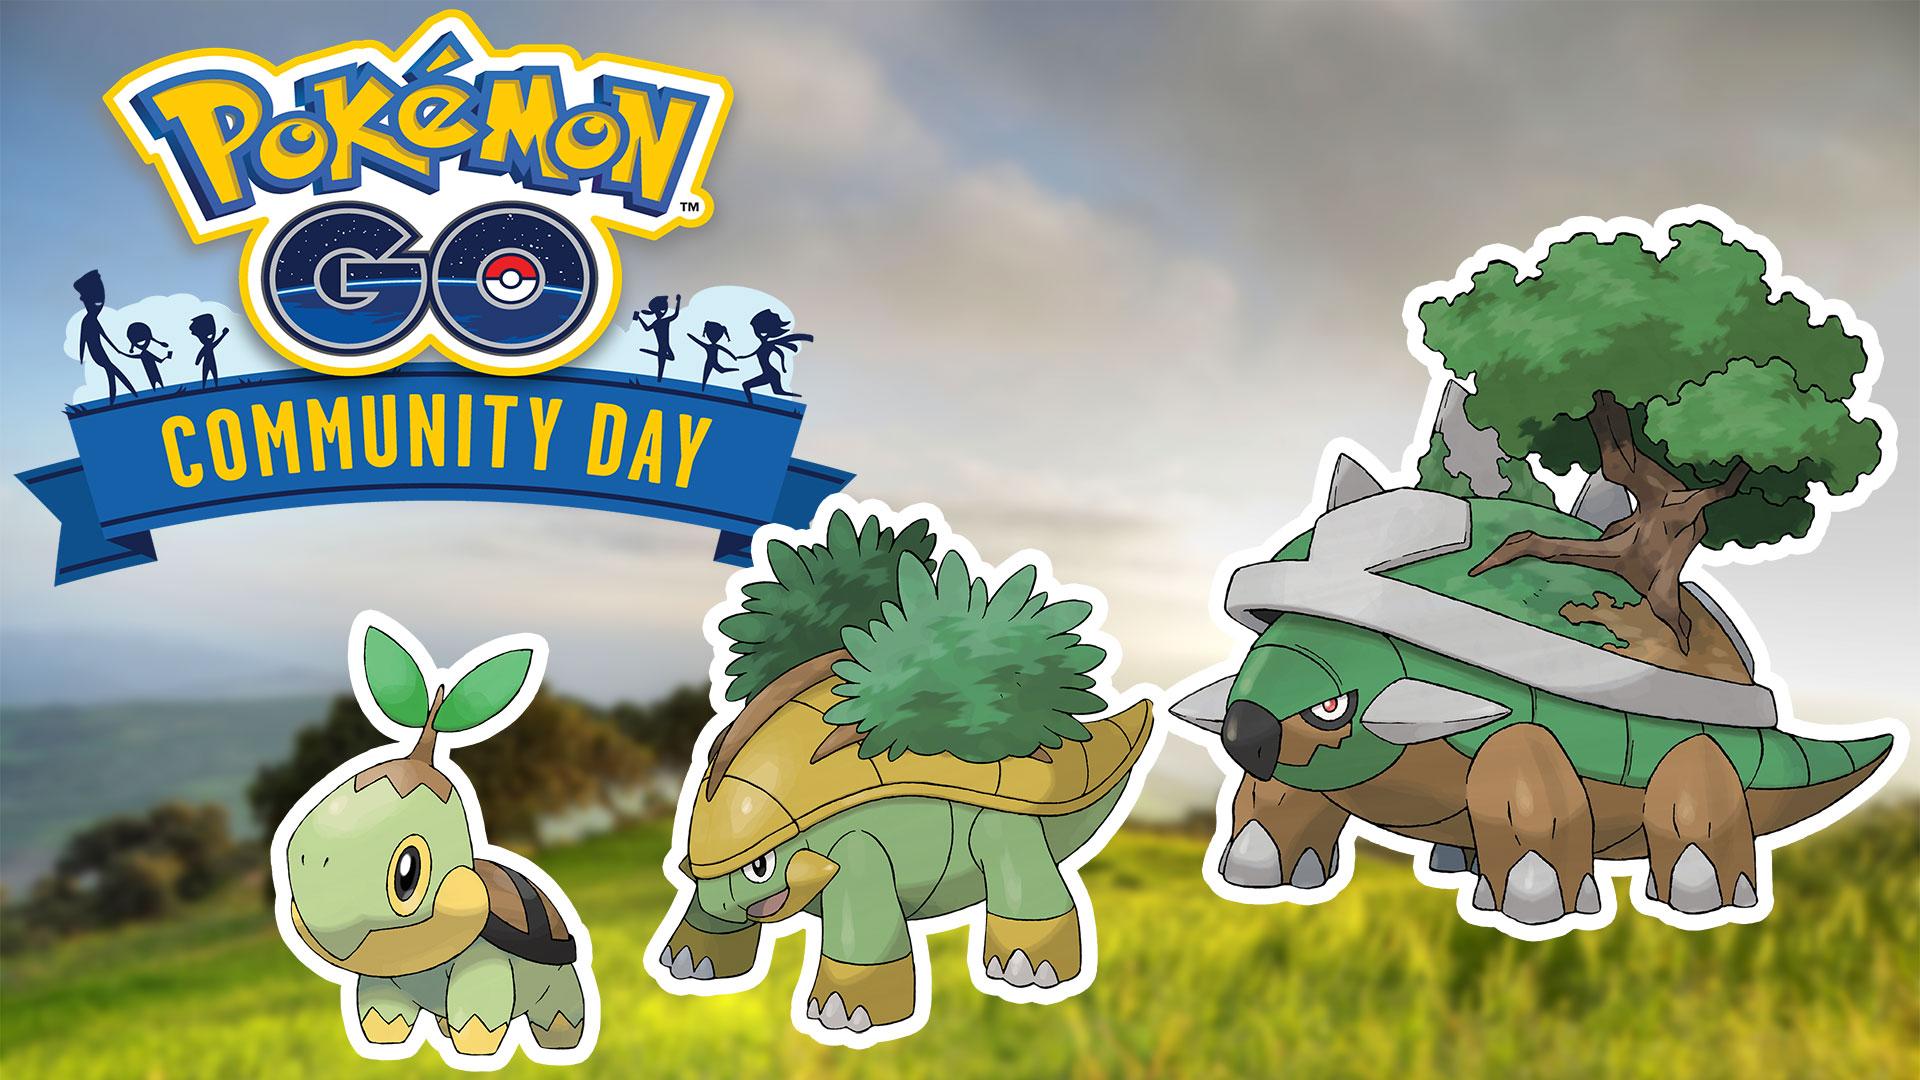 Pokemon GO Turtwig community day banner